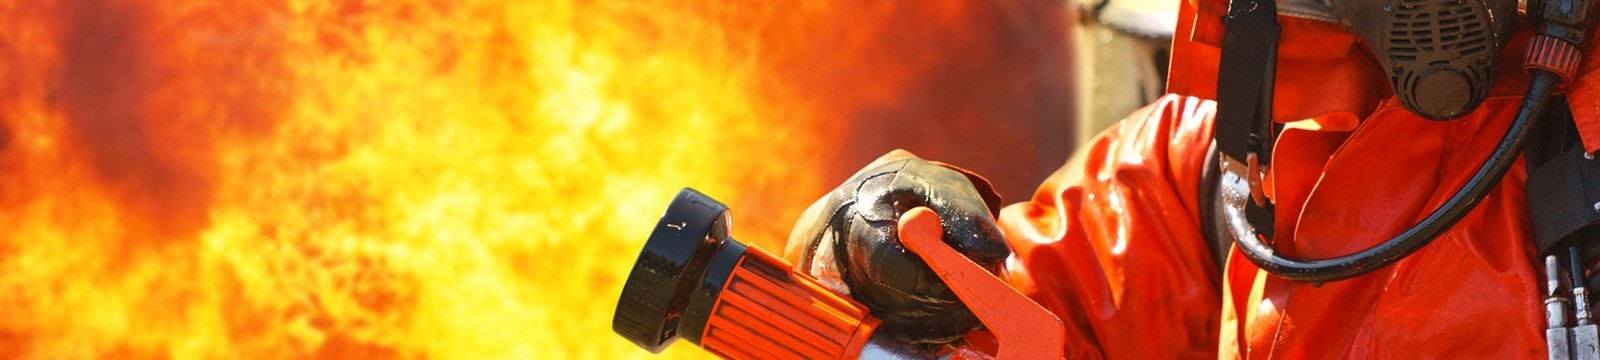 Munkavédelem - Tűzvédelem - Minőségirányítás